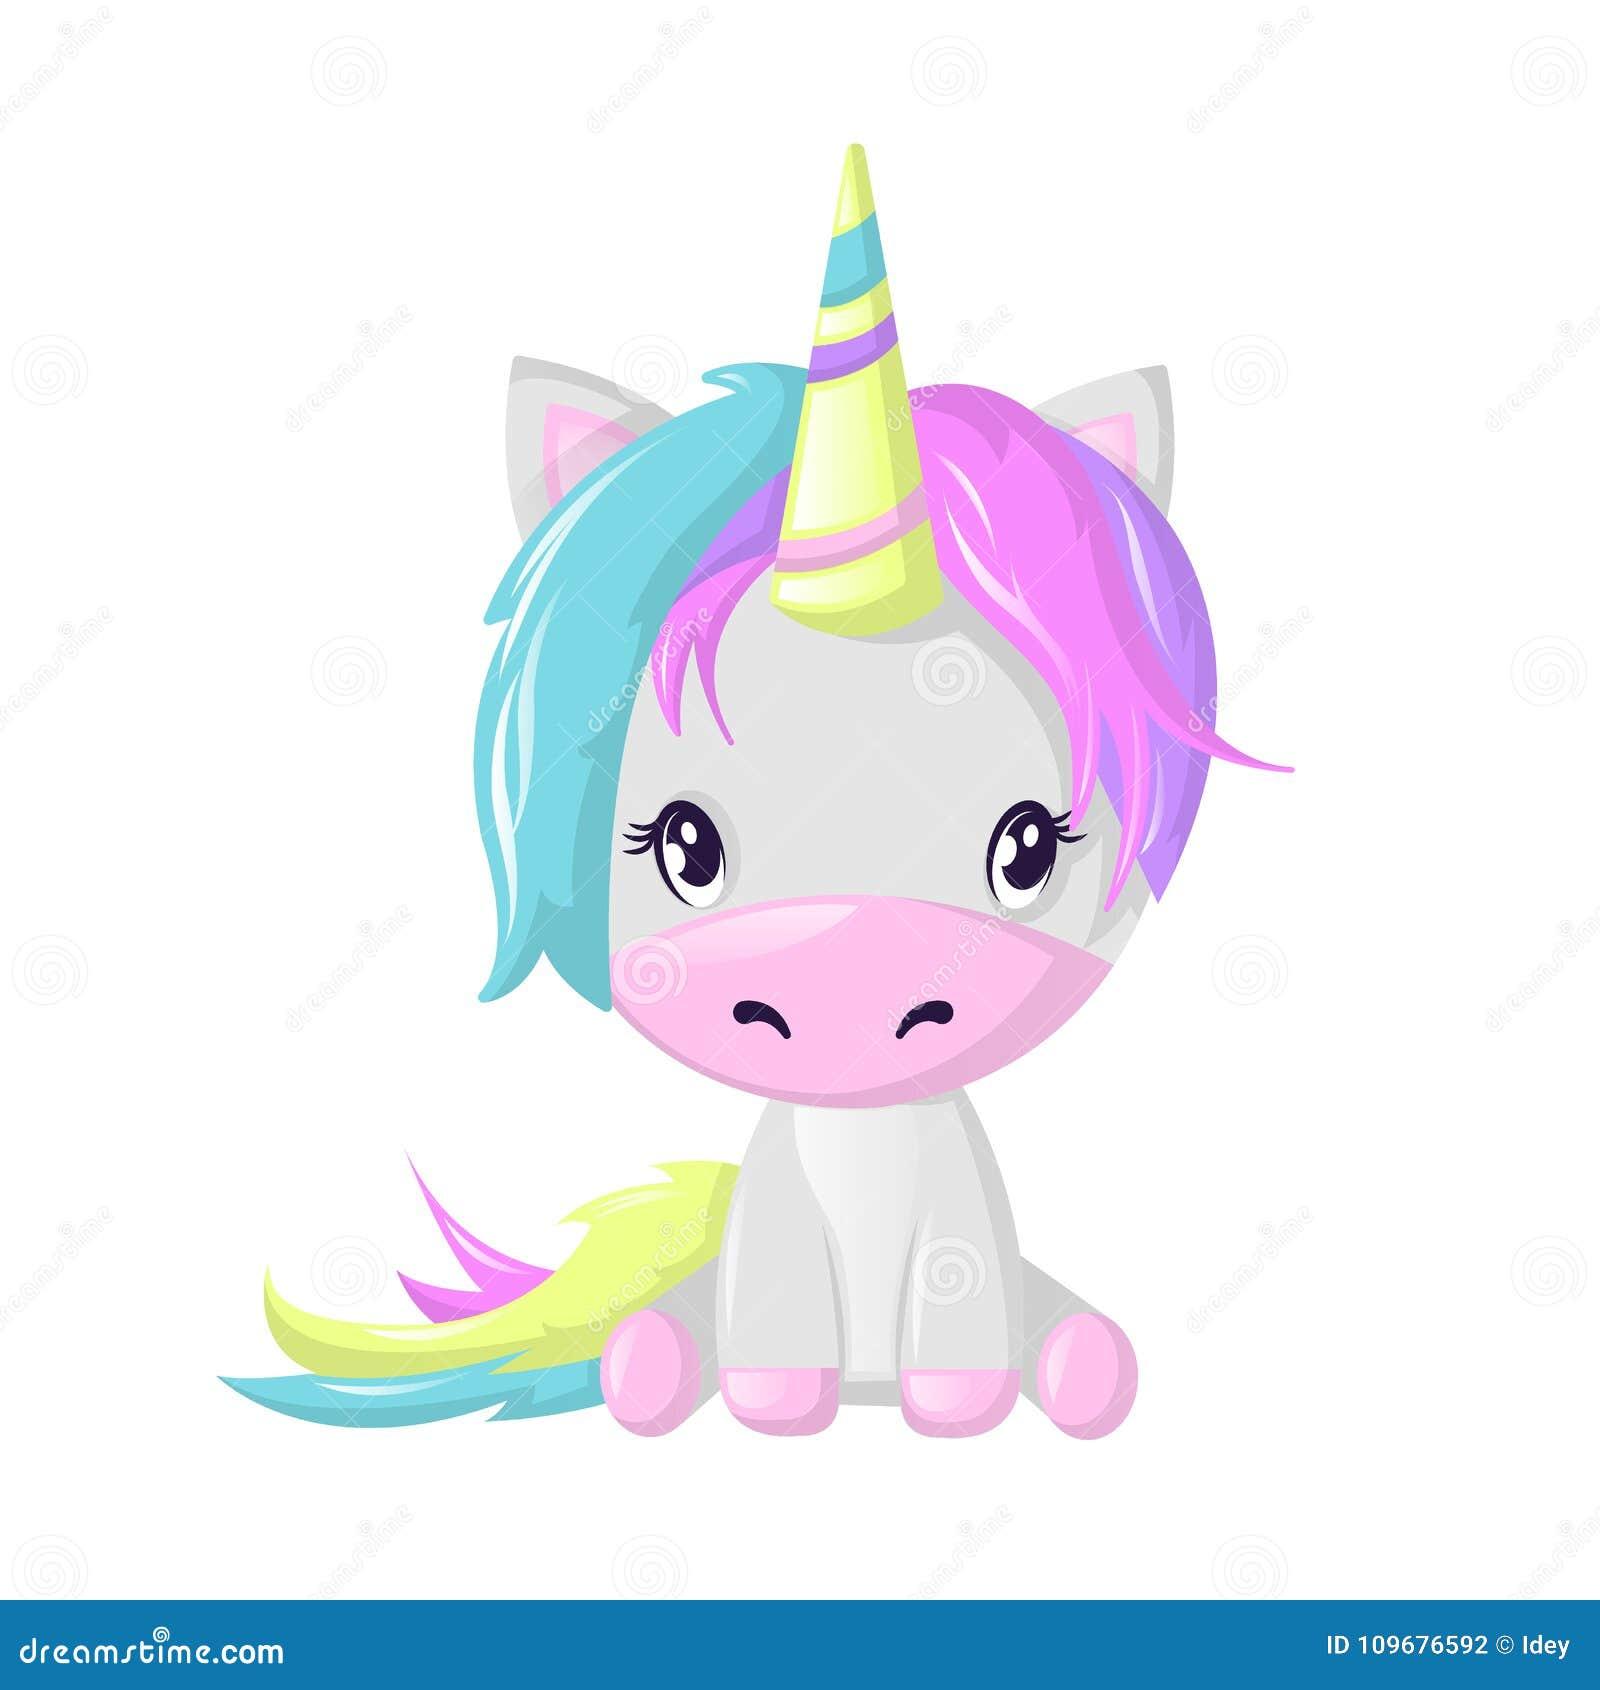 Personaje De Dibujos Animados Ficticio Hermoso Divertido Unicornio